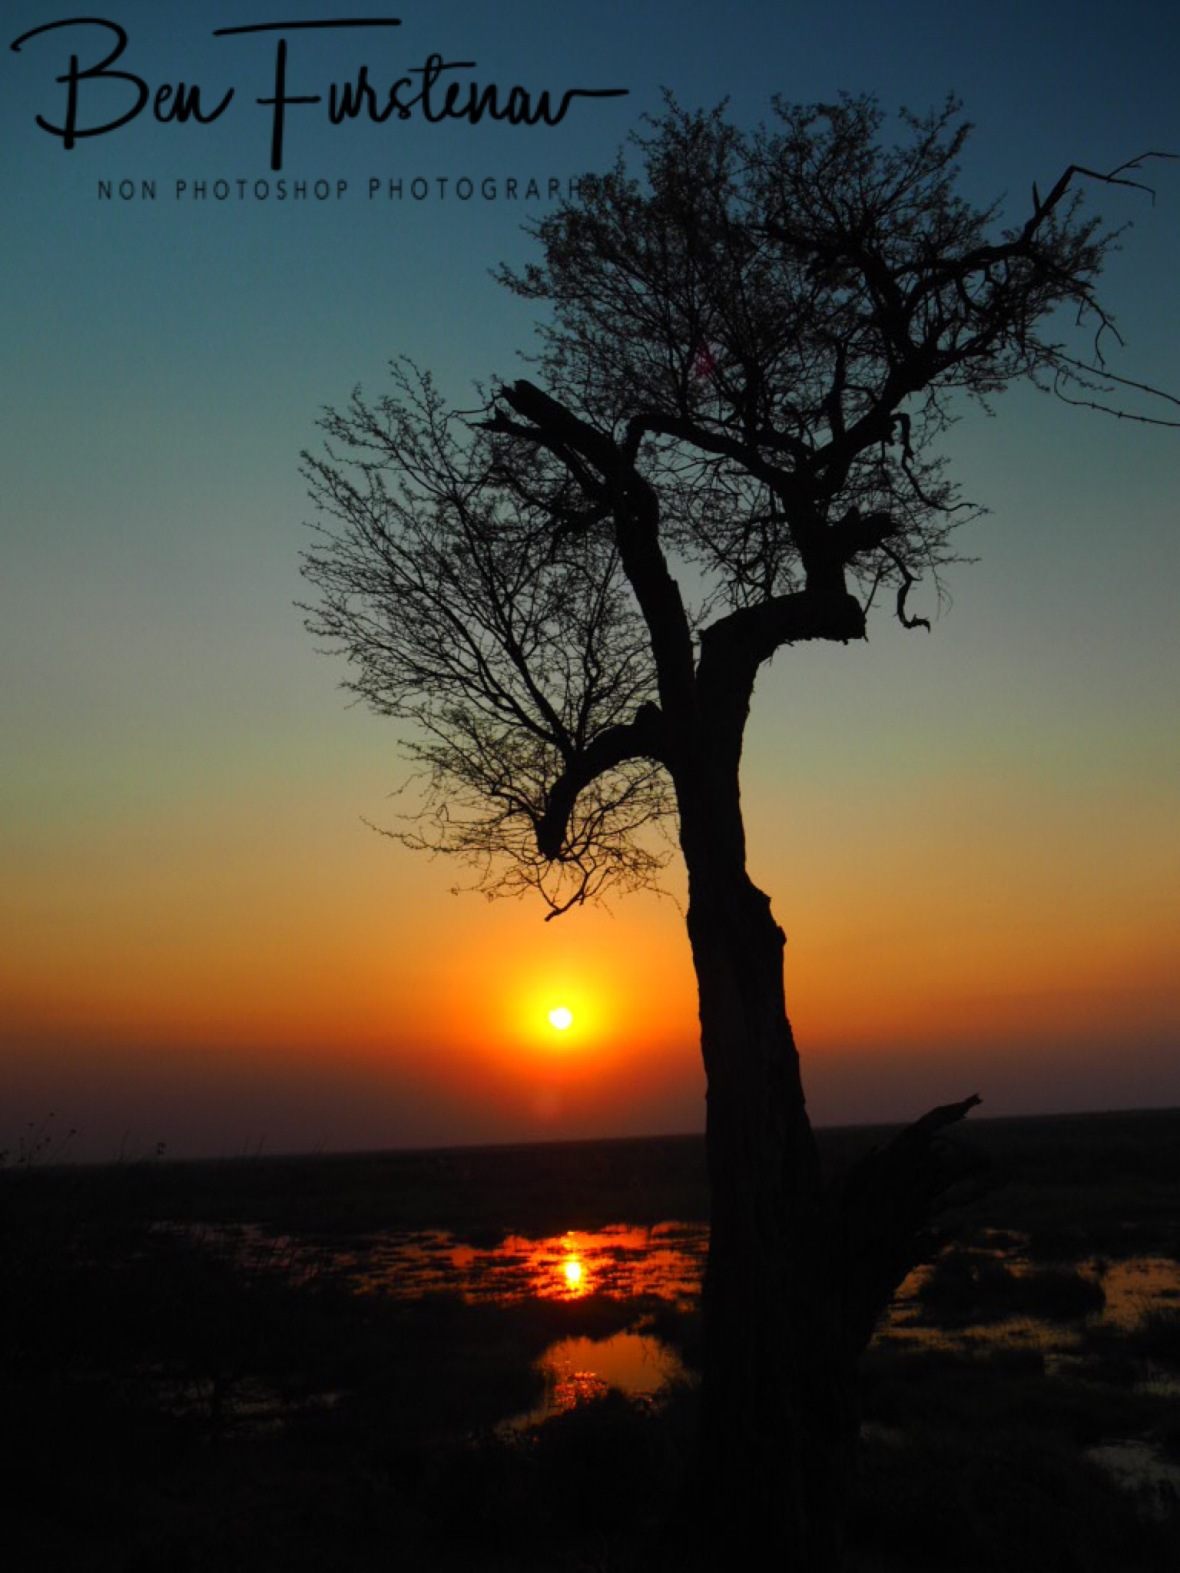 Sun fading over Linyanti swamp, Chobe National Park, Okavango Delta, Botswana